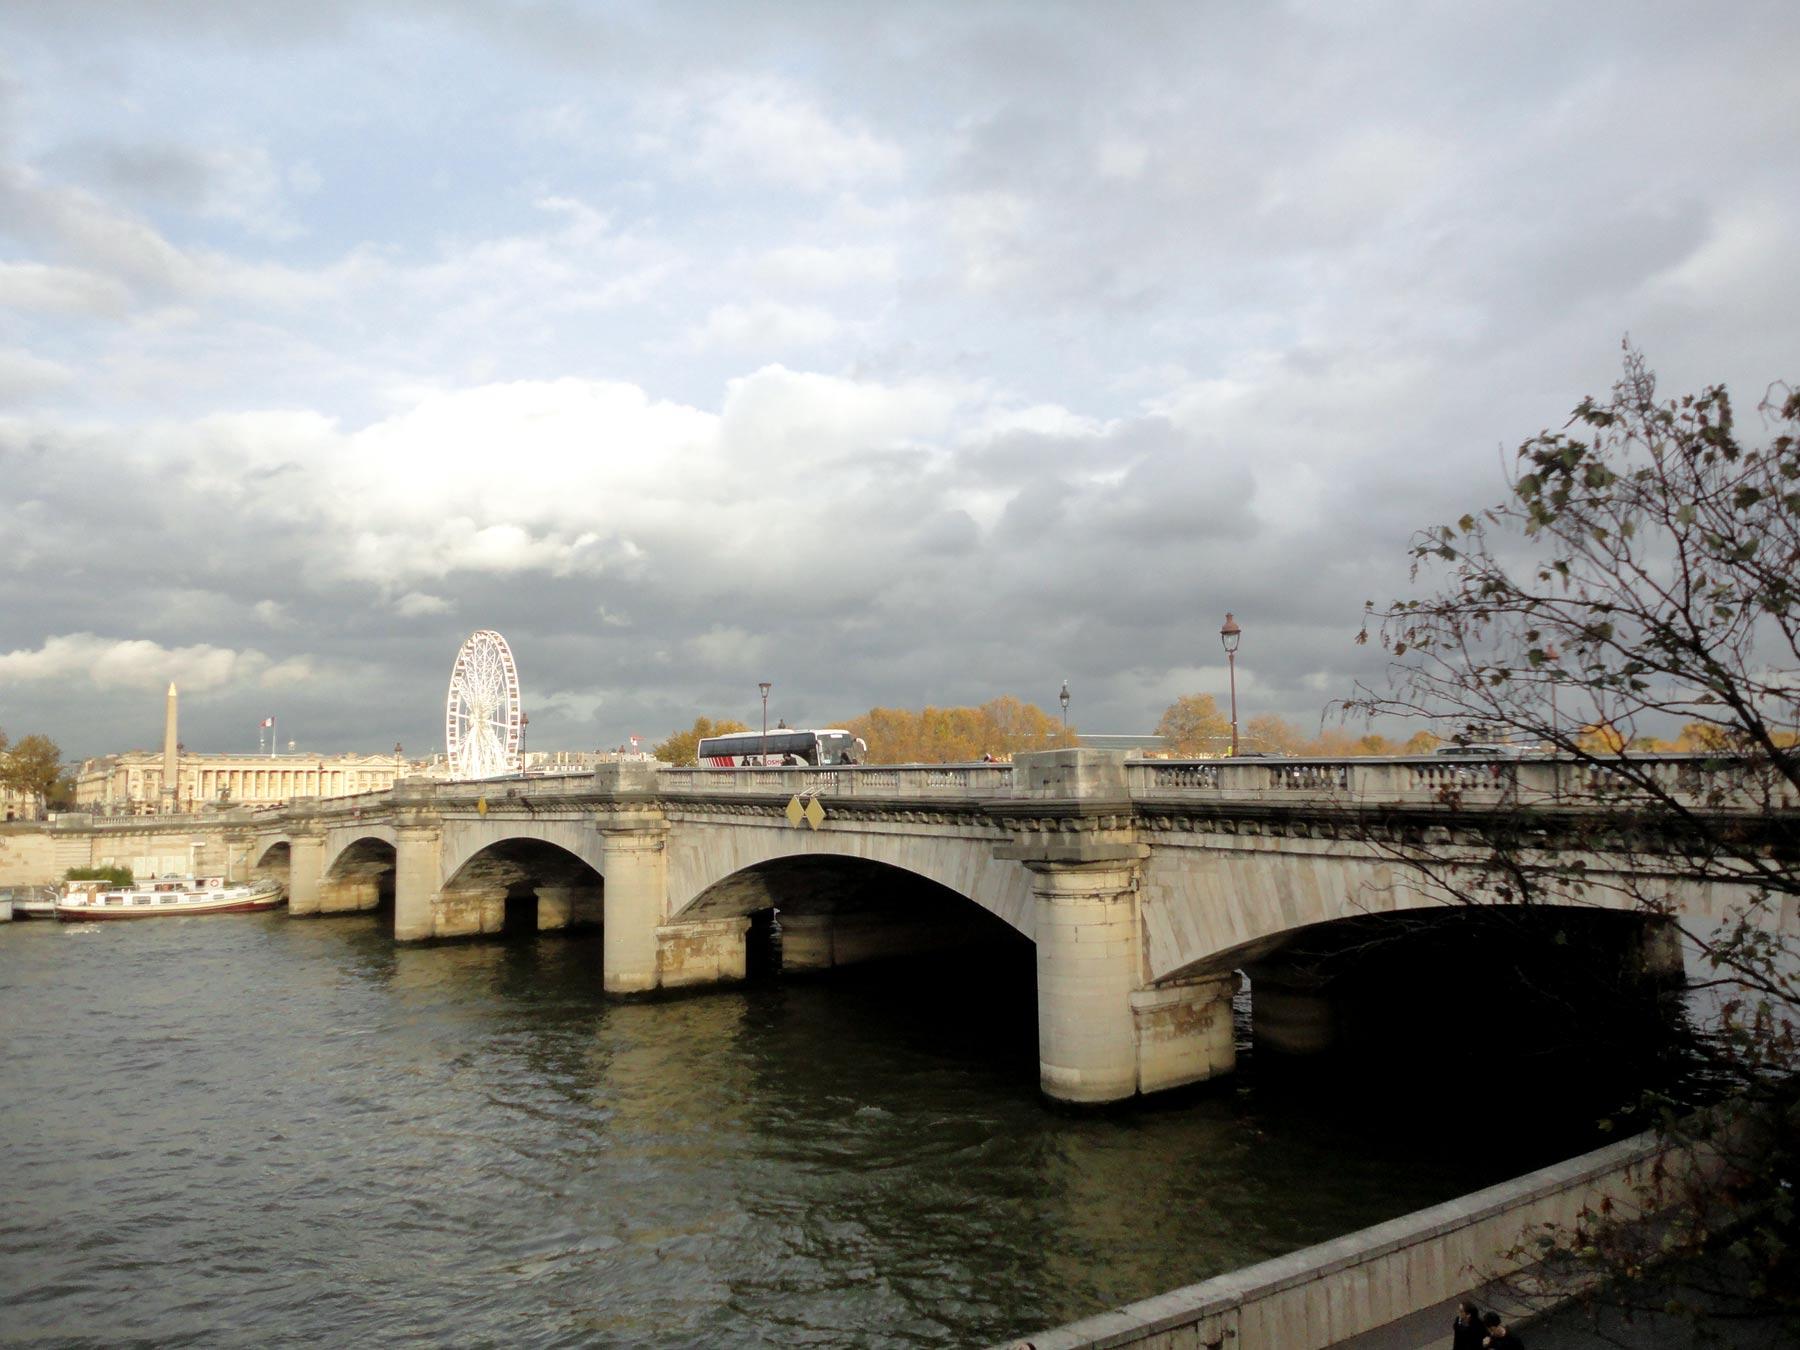 экскурсия через мост в Париже